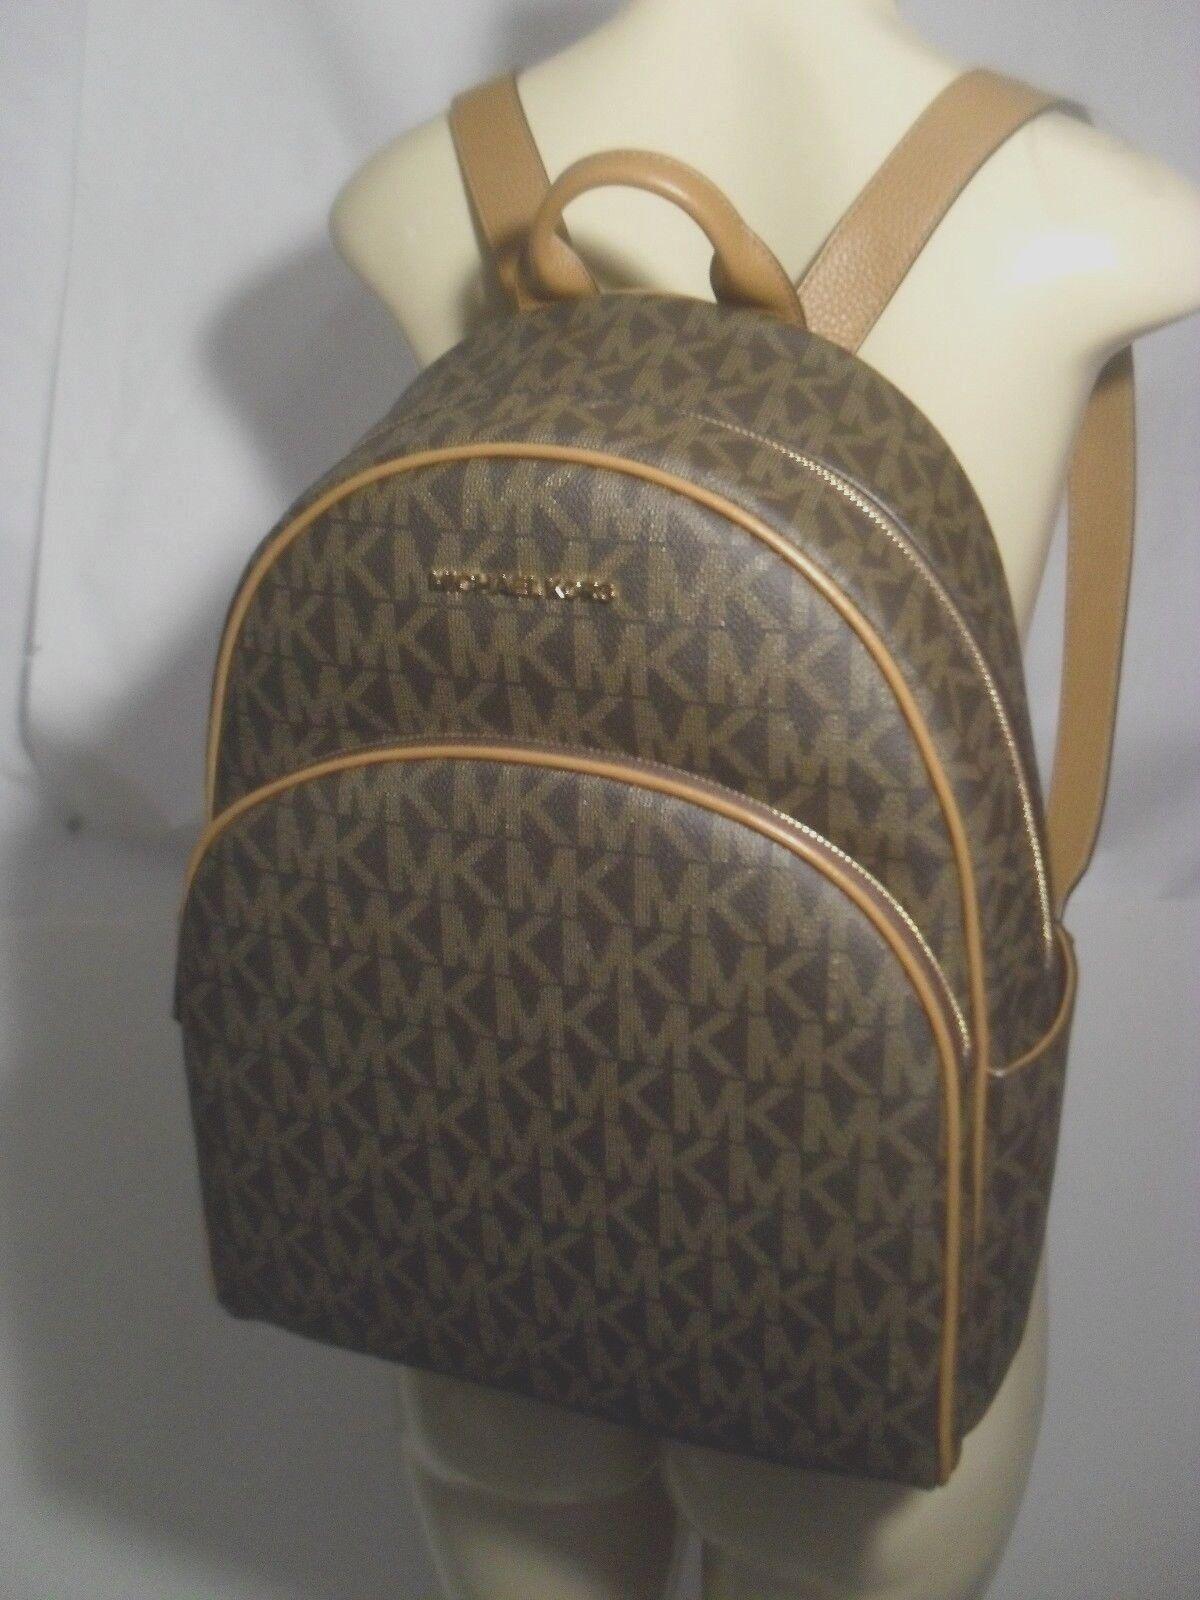 Michael Kors - NWT Michael Kors Abbey Brown Acorn PVC Large Backpack School Book Bag MK